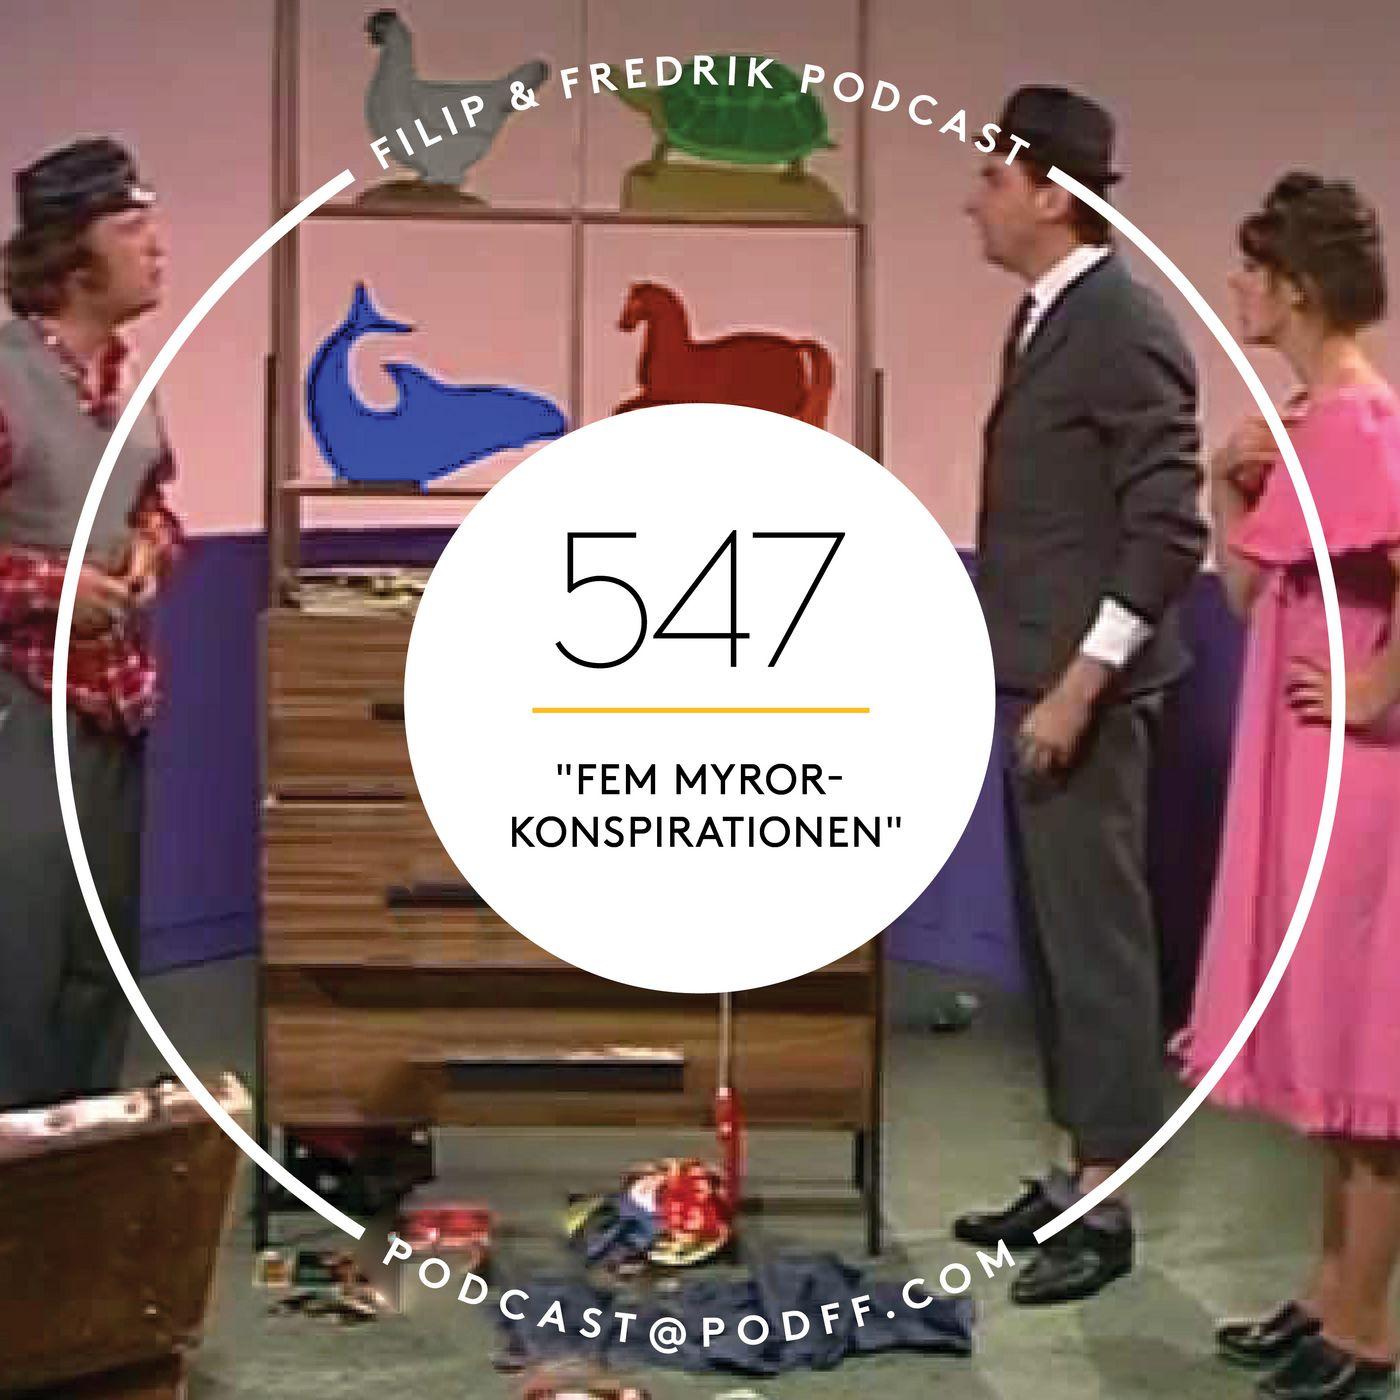 "547. ""Fem myror-konspirationen"""